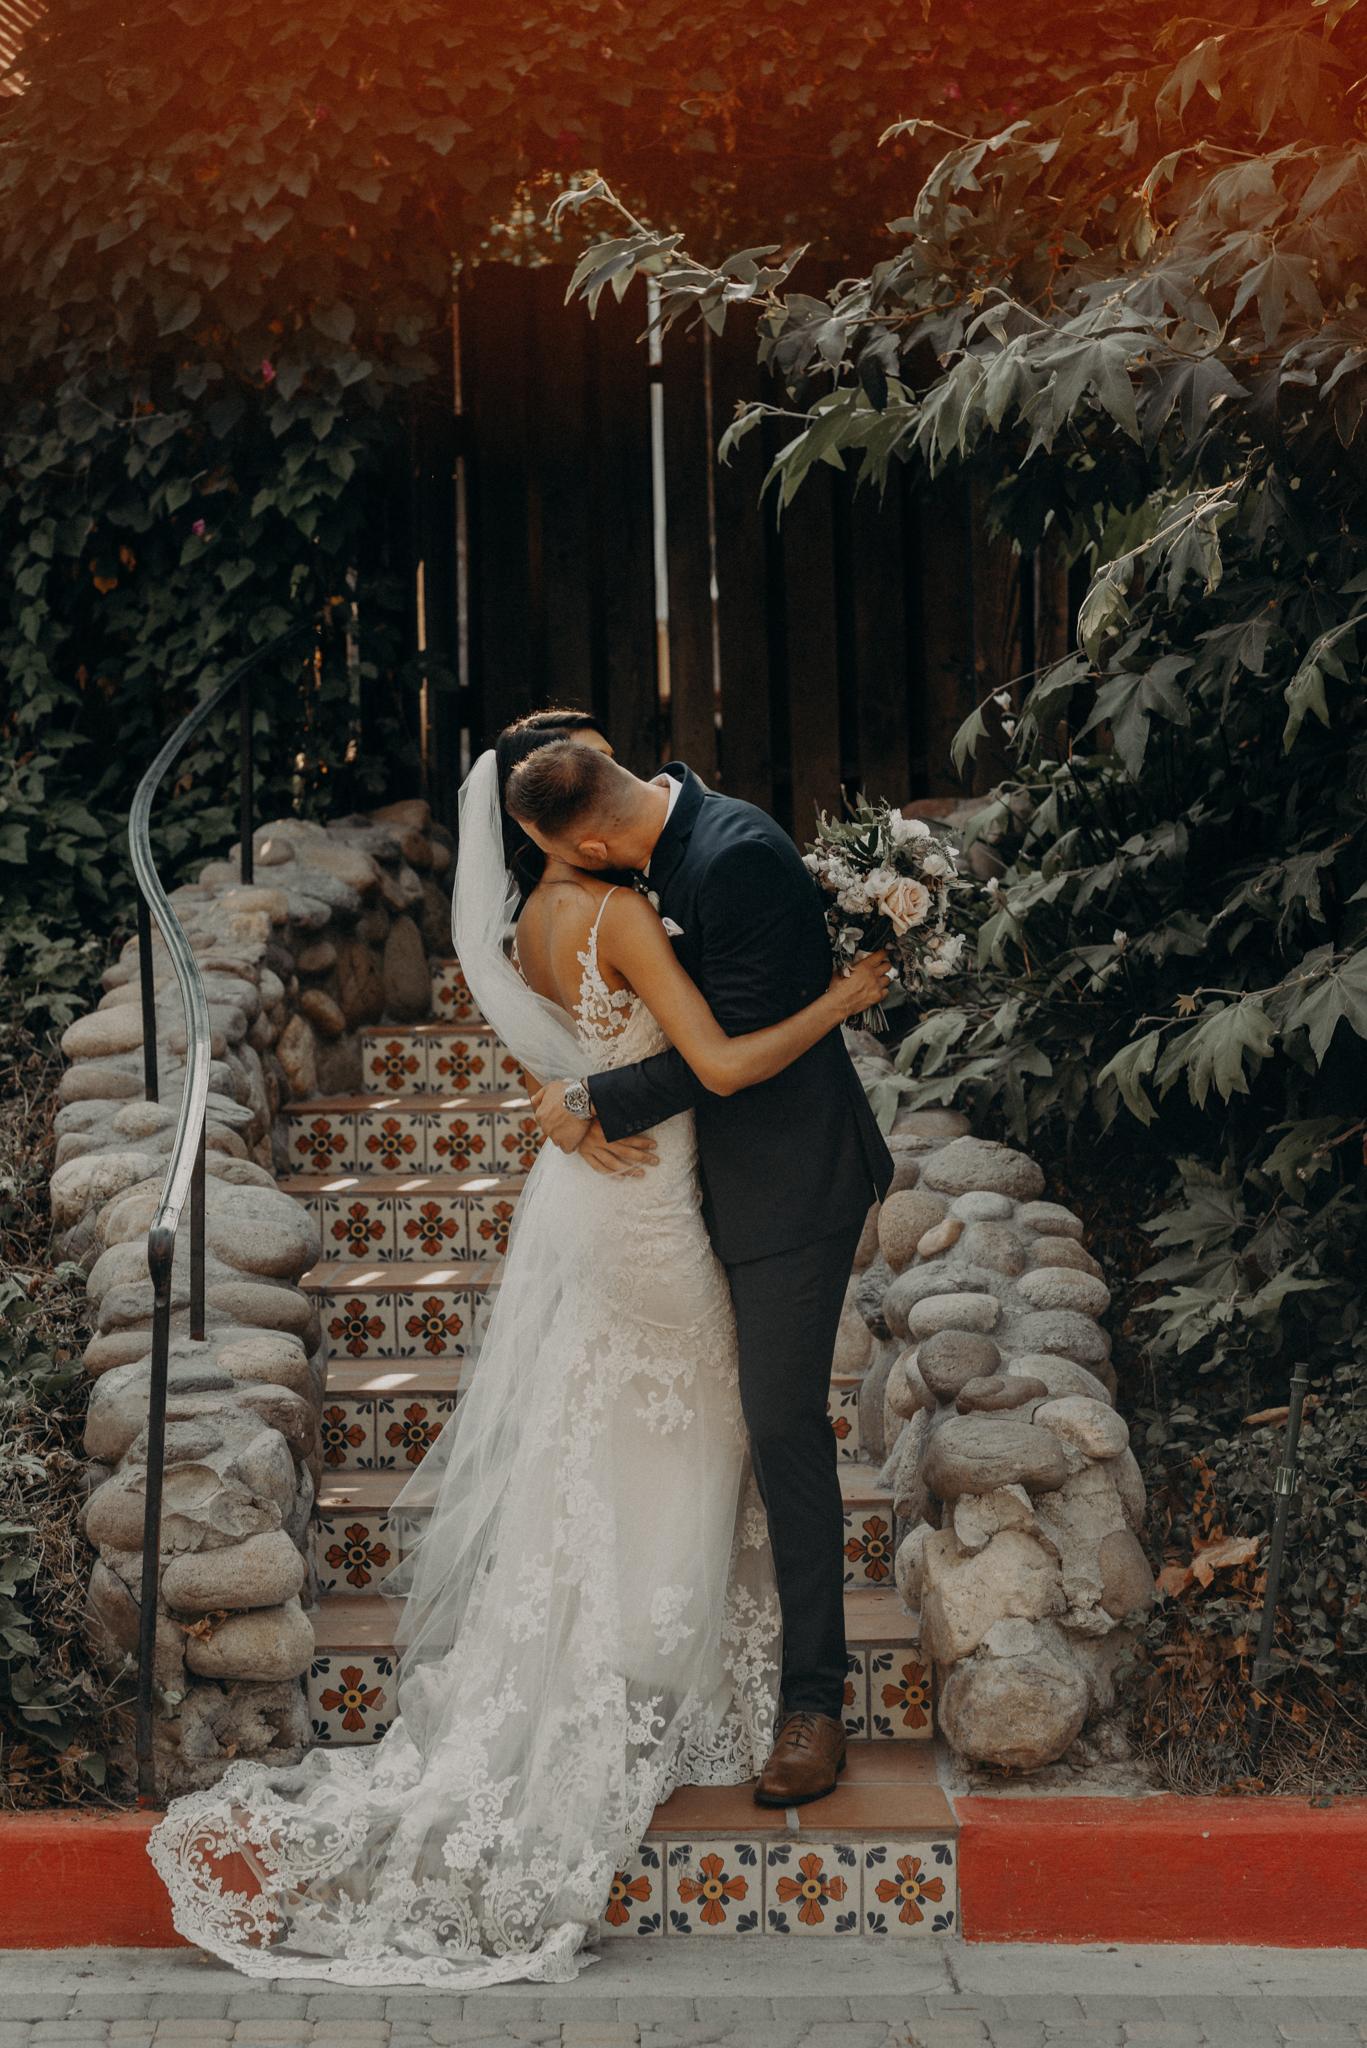 Isaiah + Taylor Photography - Rancho Las Lomas Wedding, Los Angeles Wedding Photographer-118.jpg